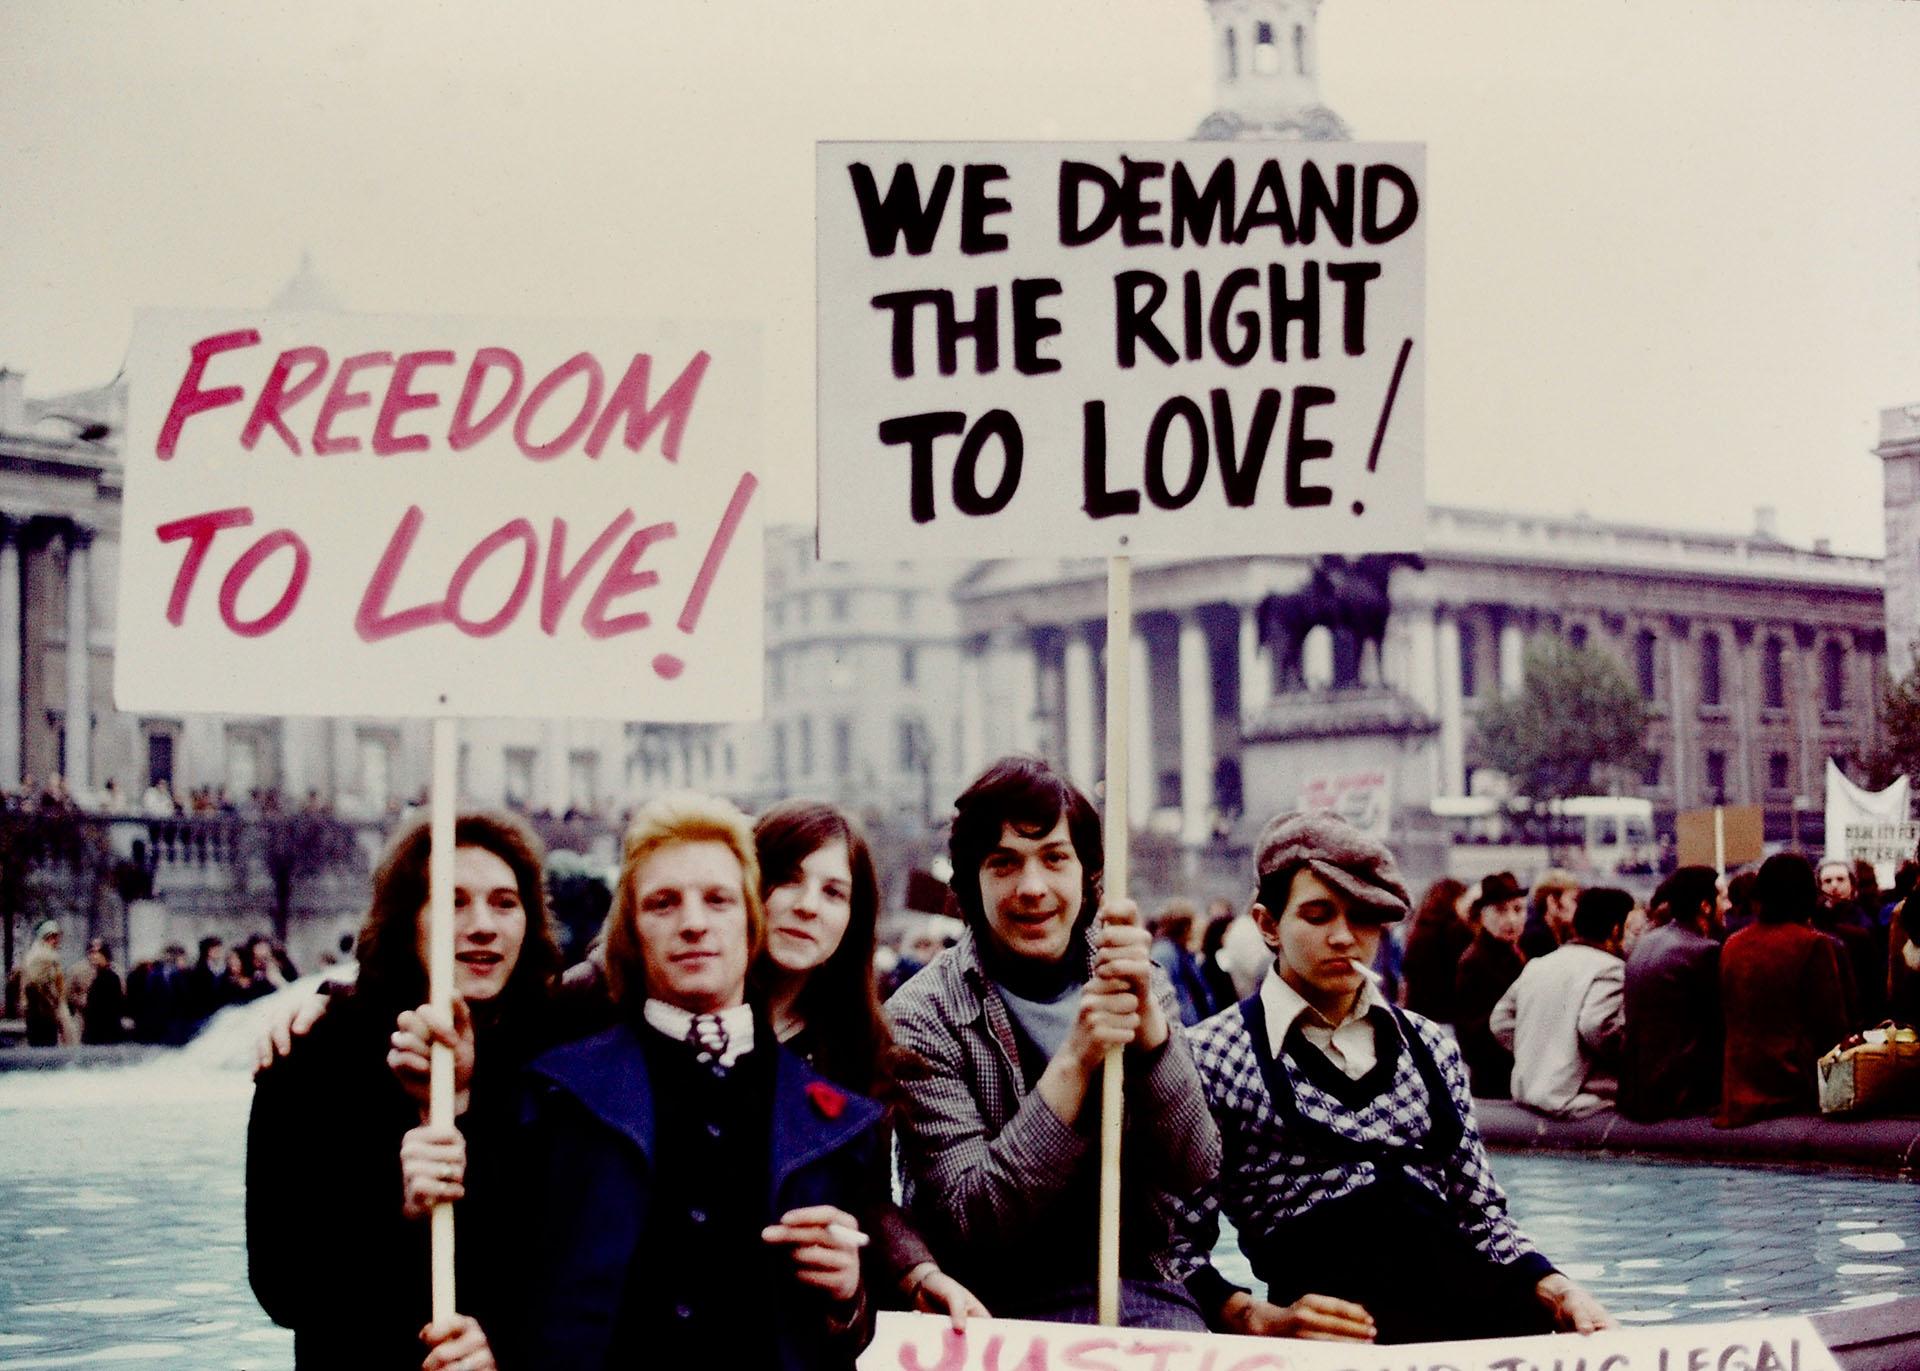 Londres, 28 de agosto de 1971. Cientos de ingleses se manifestaron durante horas en Trafalgar Square